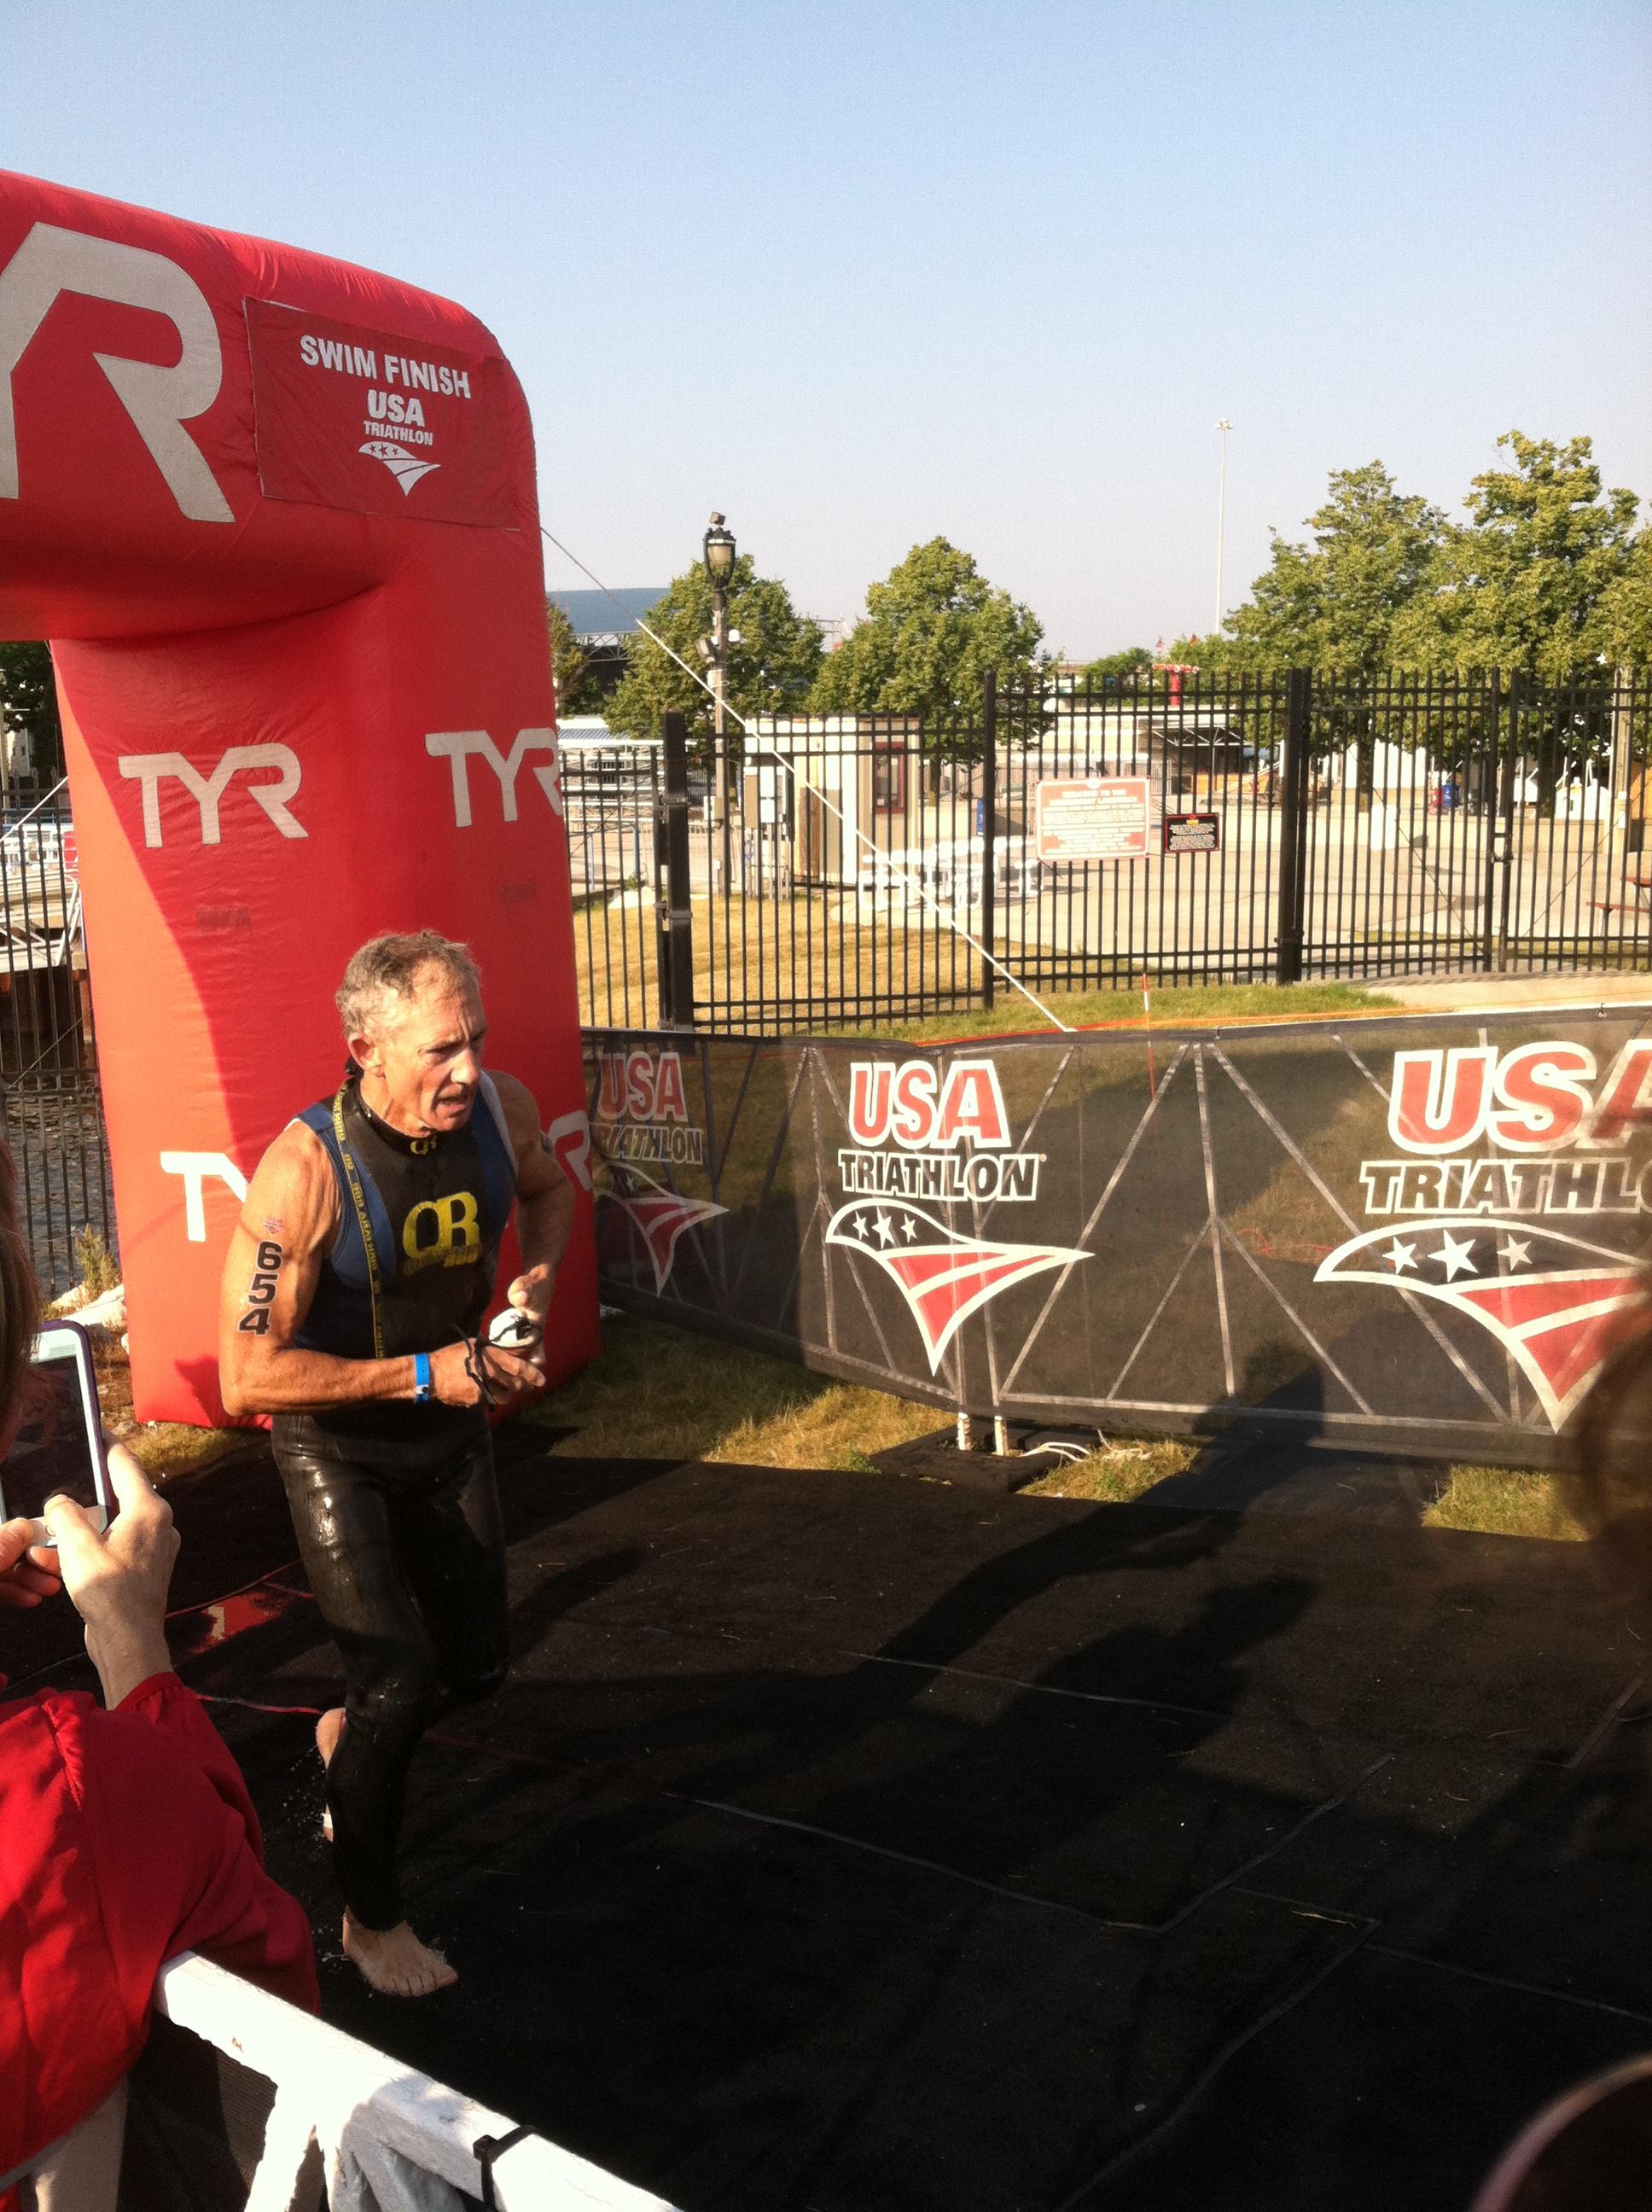 Doug running across the finish line at the triathlon